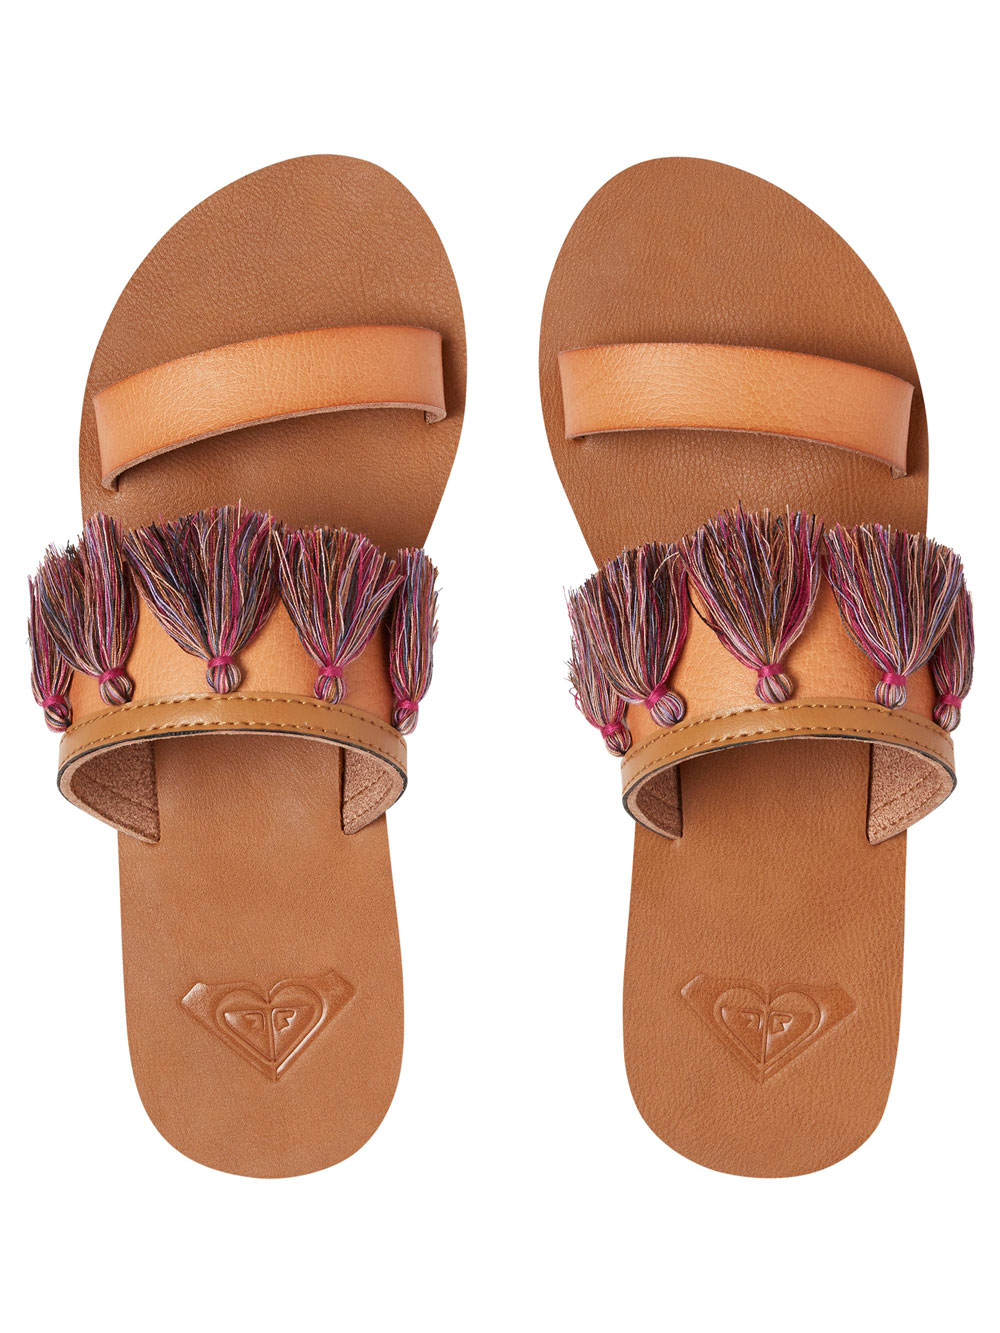 roxy-izzy-sandals